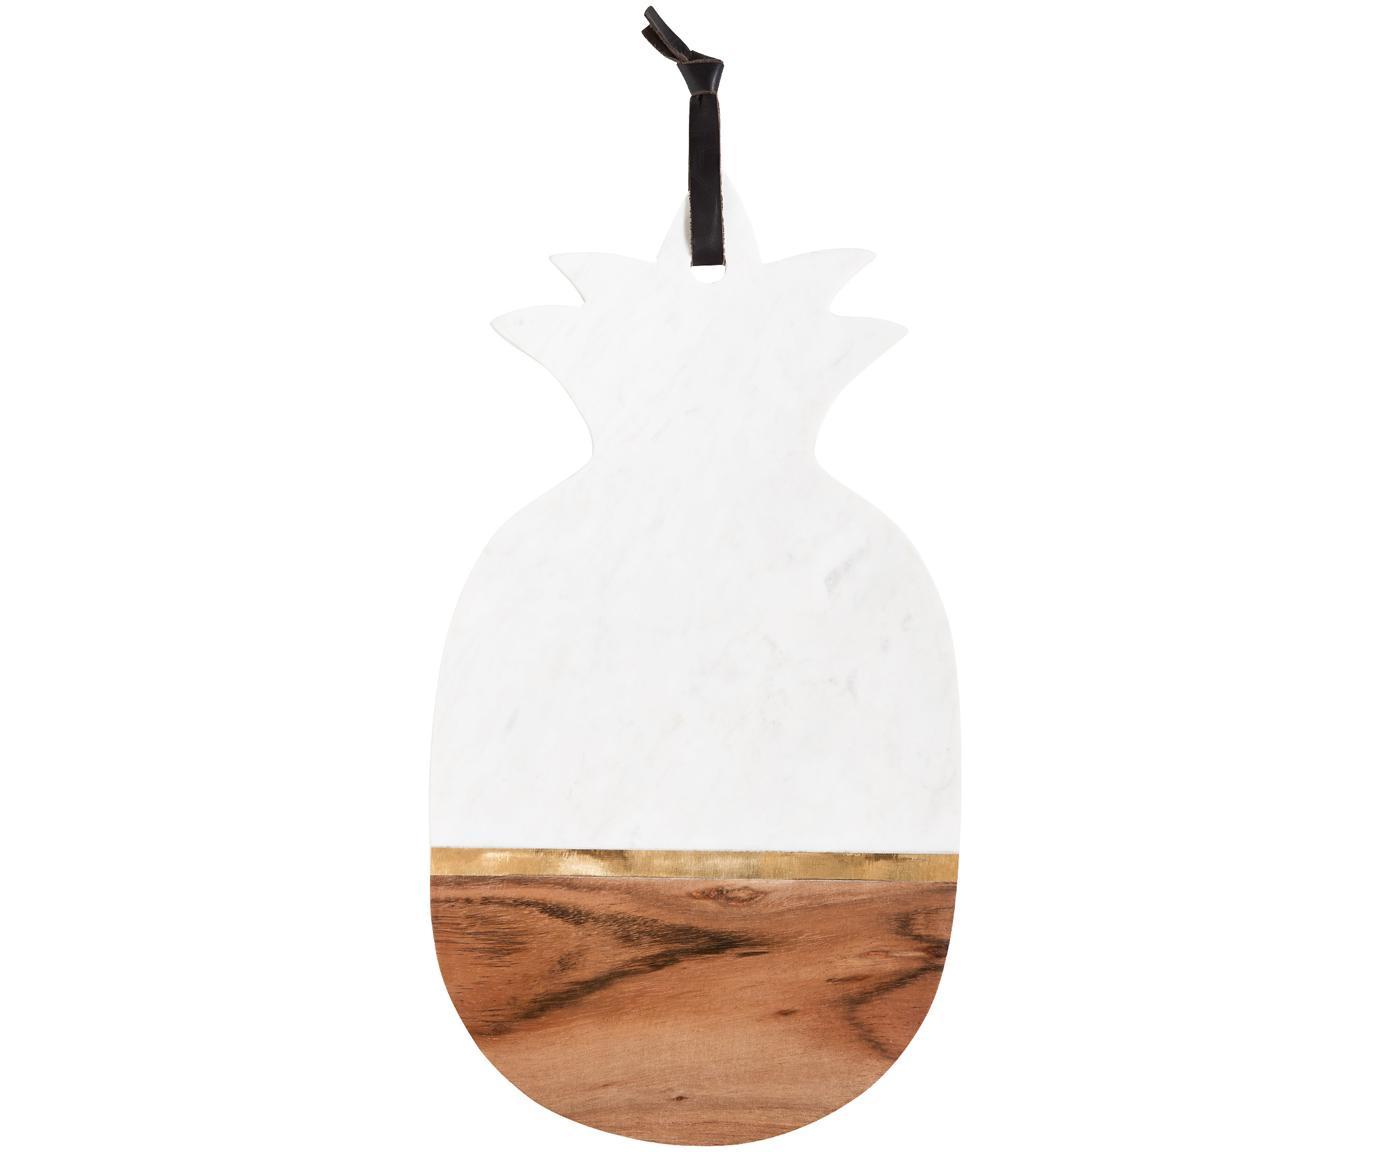 Marmeren snijplank Luxory Kitchen, Marmer, acaciahout, messing, Wit, acaciahoutkleurig, messingkleurig, B 40 x D 20 cm